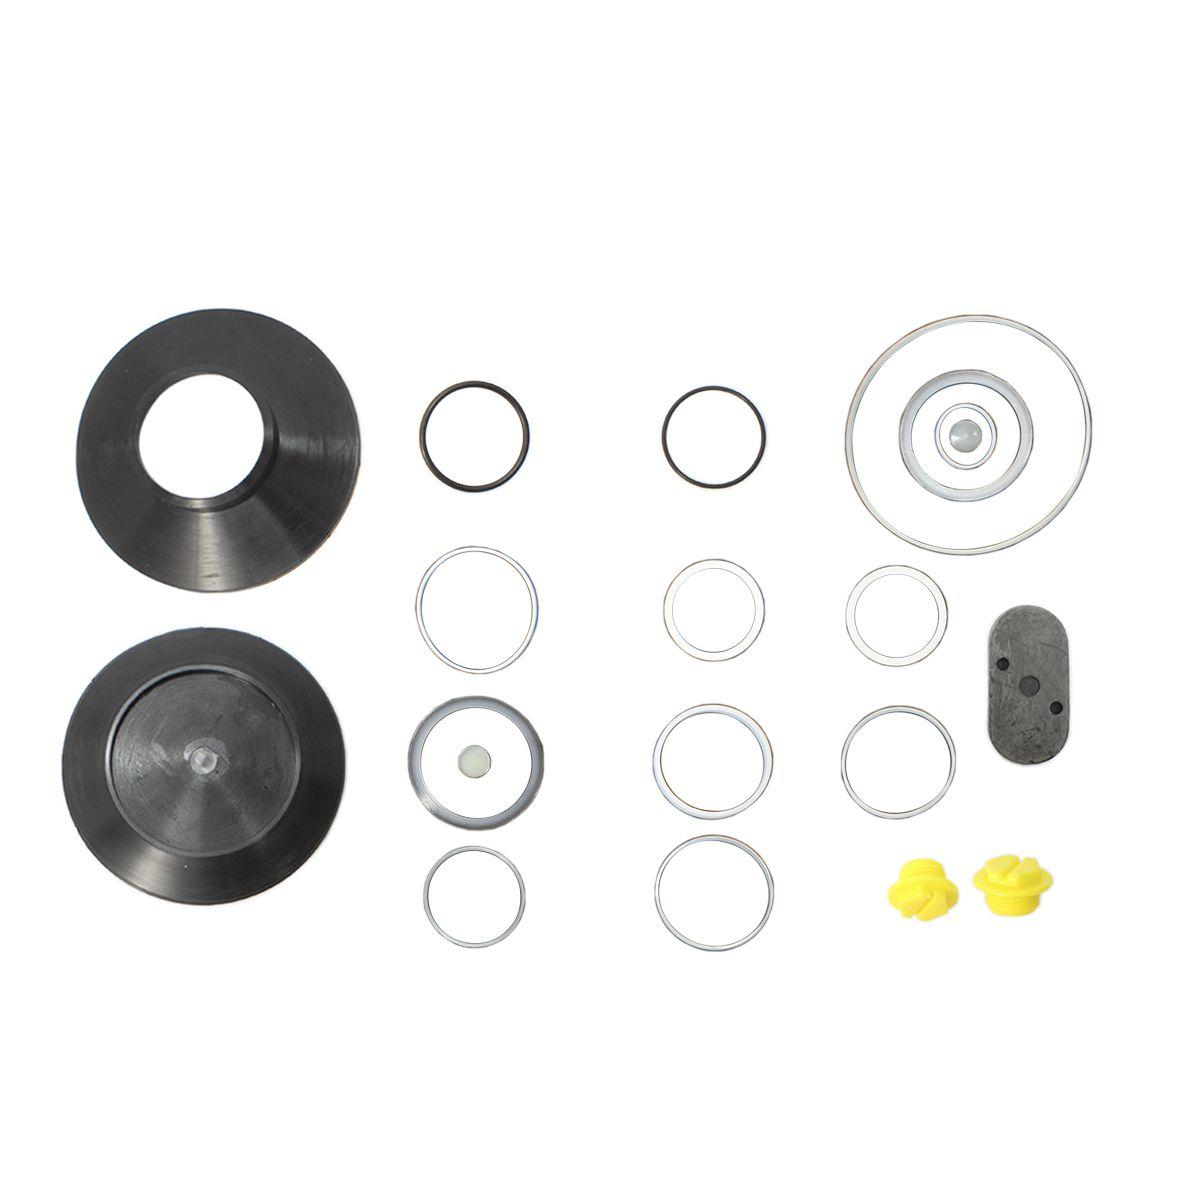 Reparo Cx Direção Hidráulica Zf 8-140 Co/ 8-150 Od/ 9-150 Od